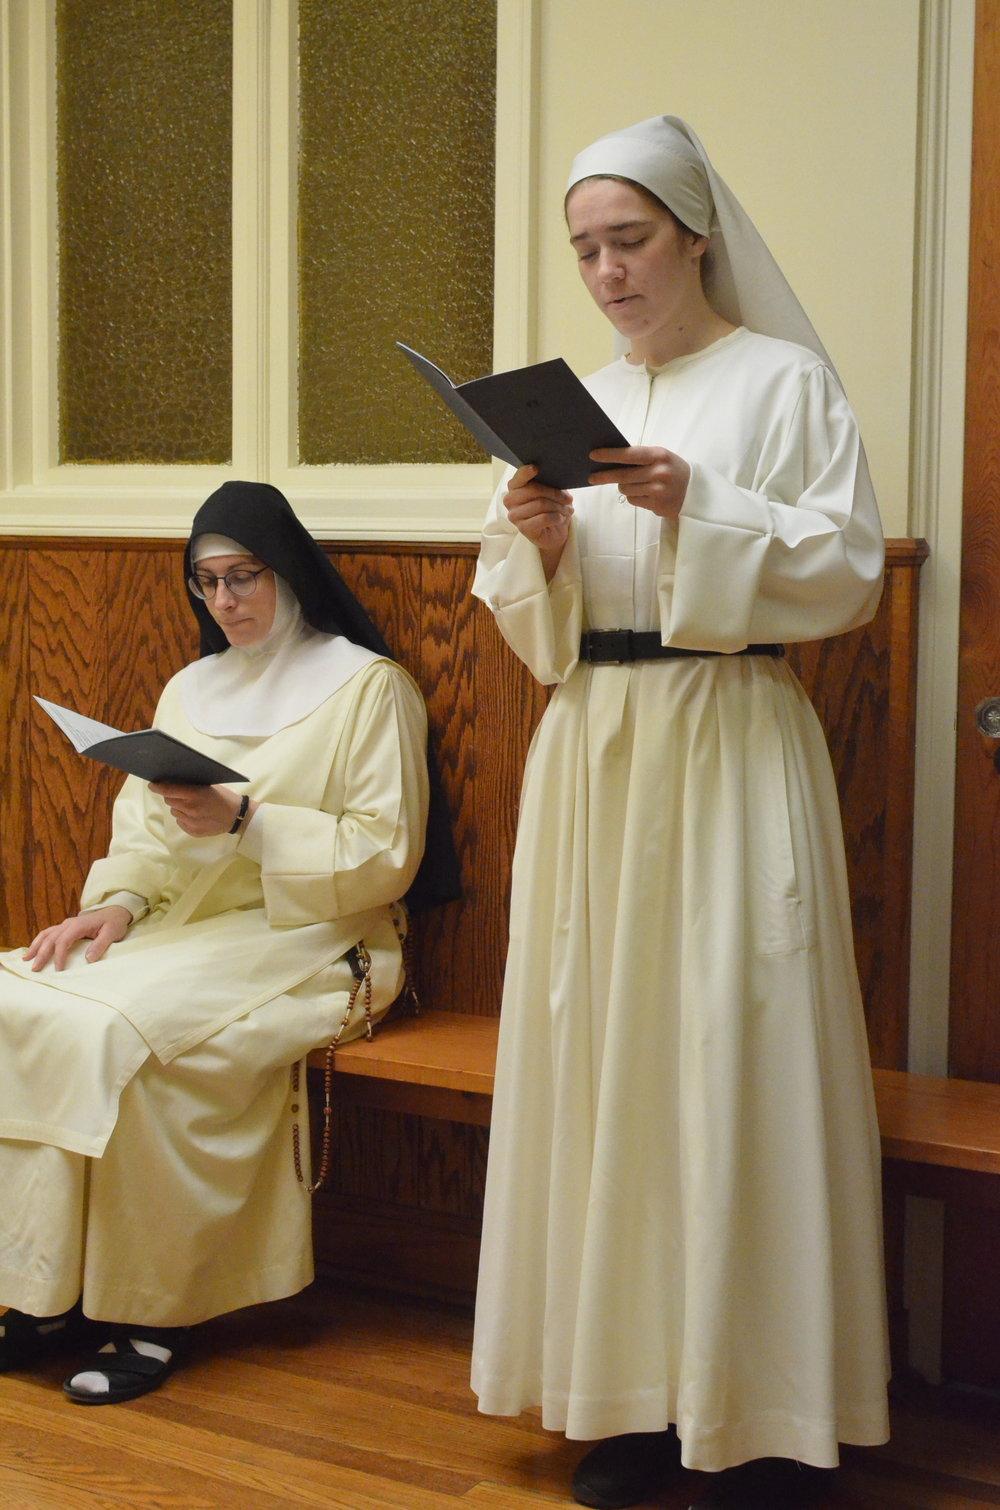 The Postulant